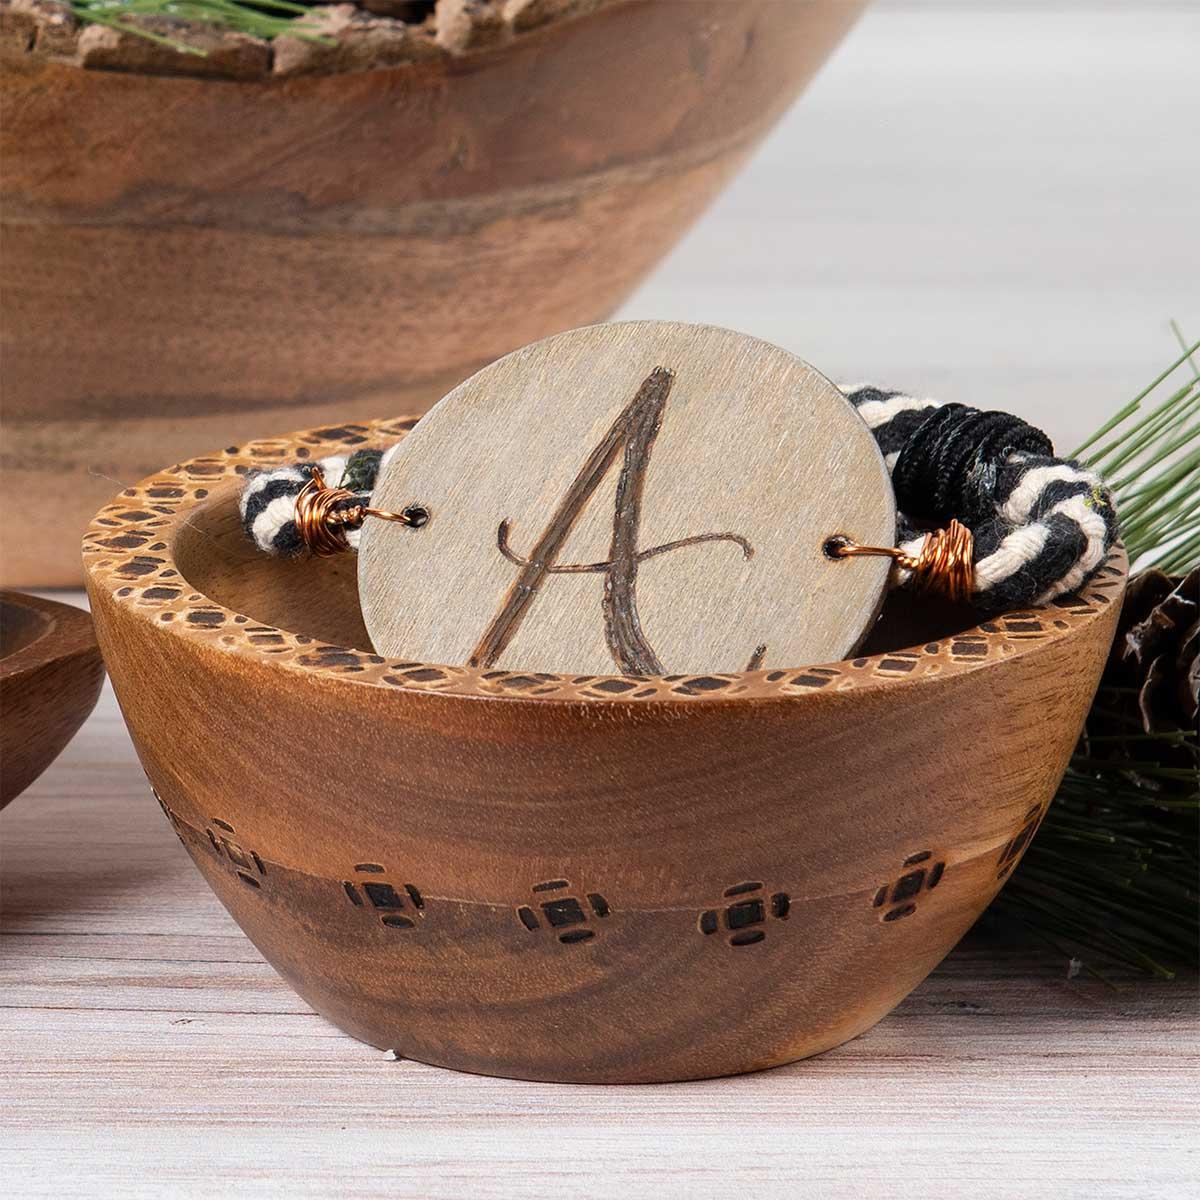 DIY Wood Burned Monogram Bracelet